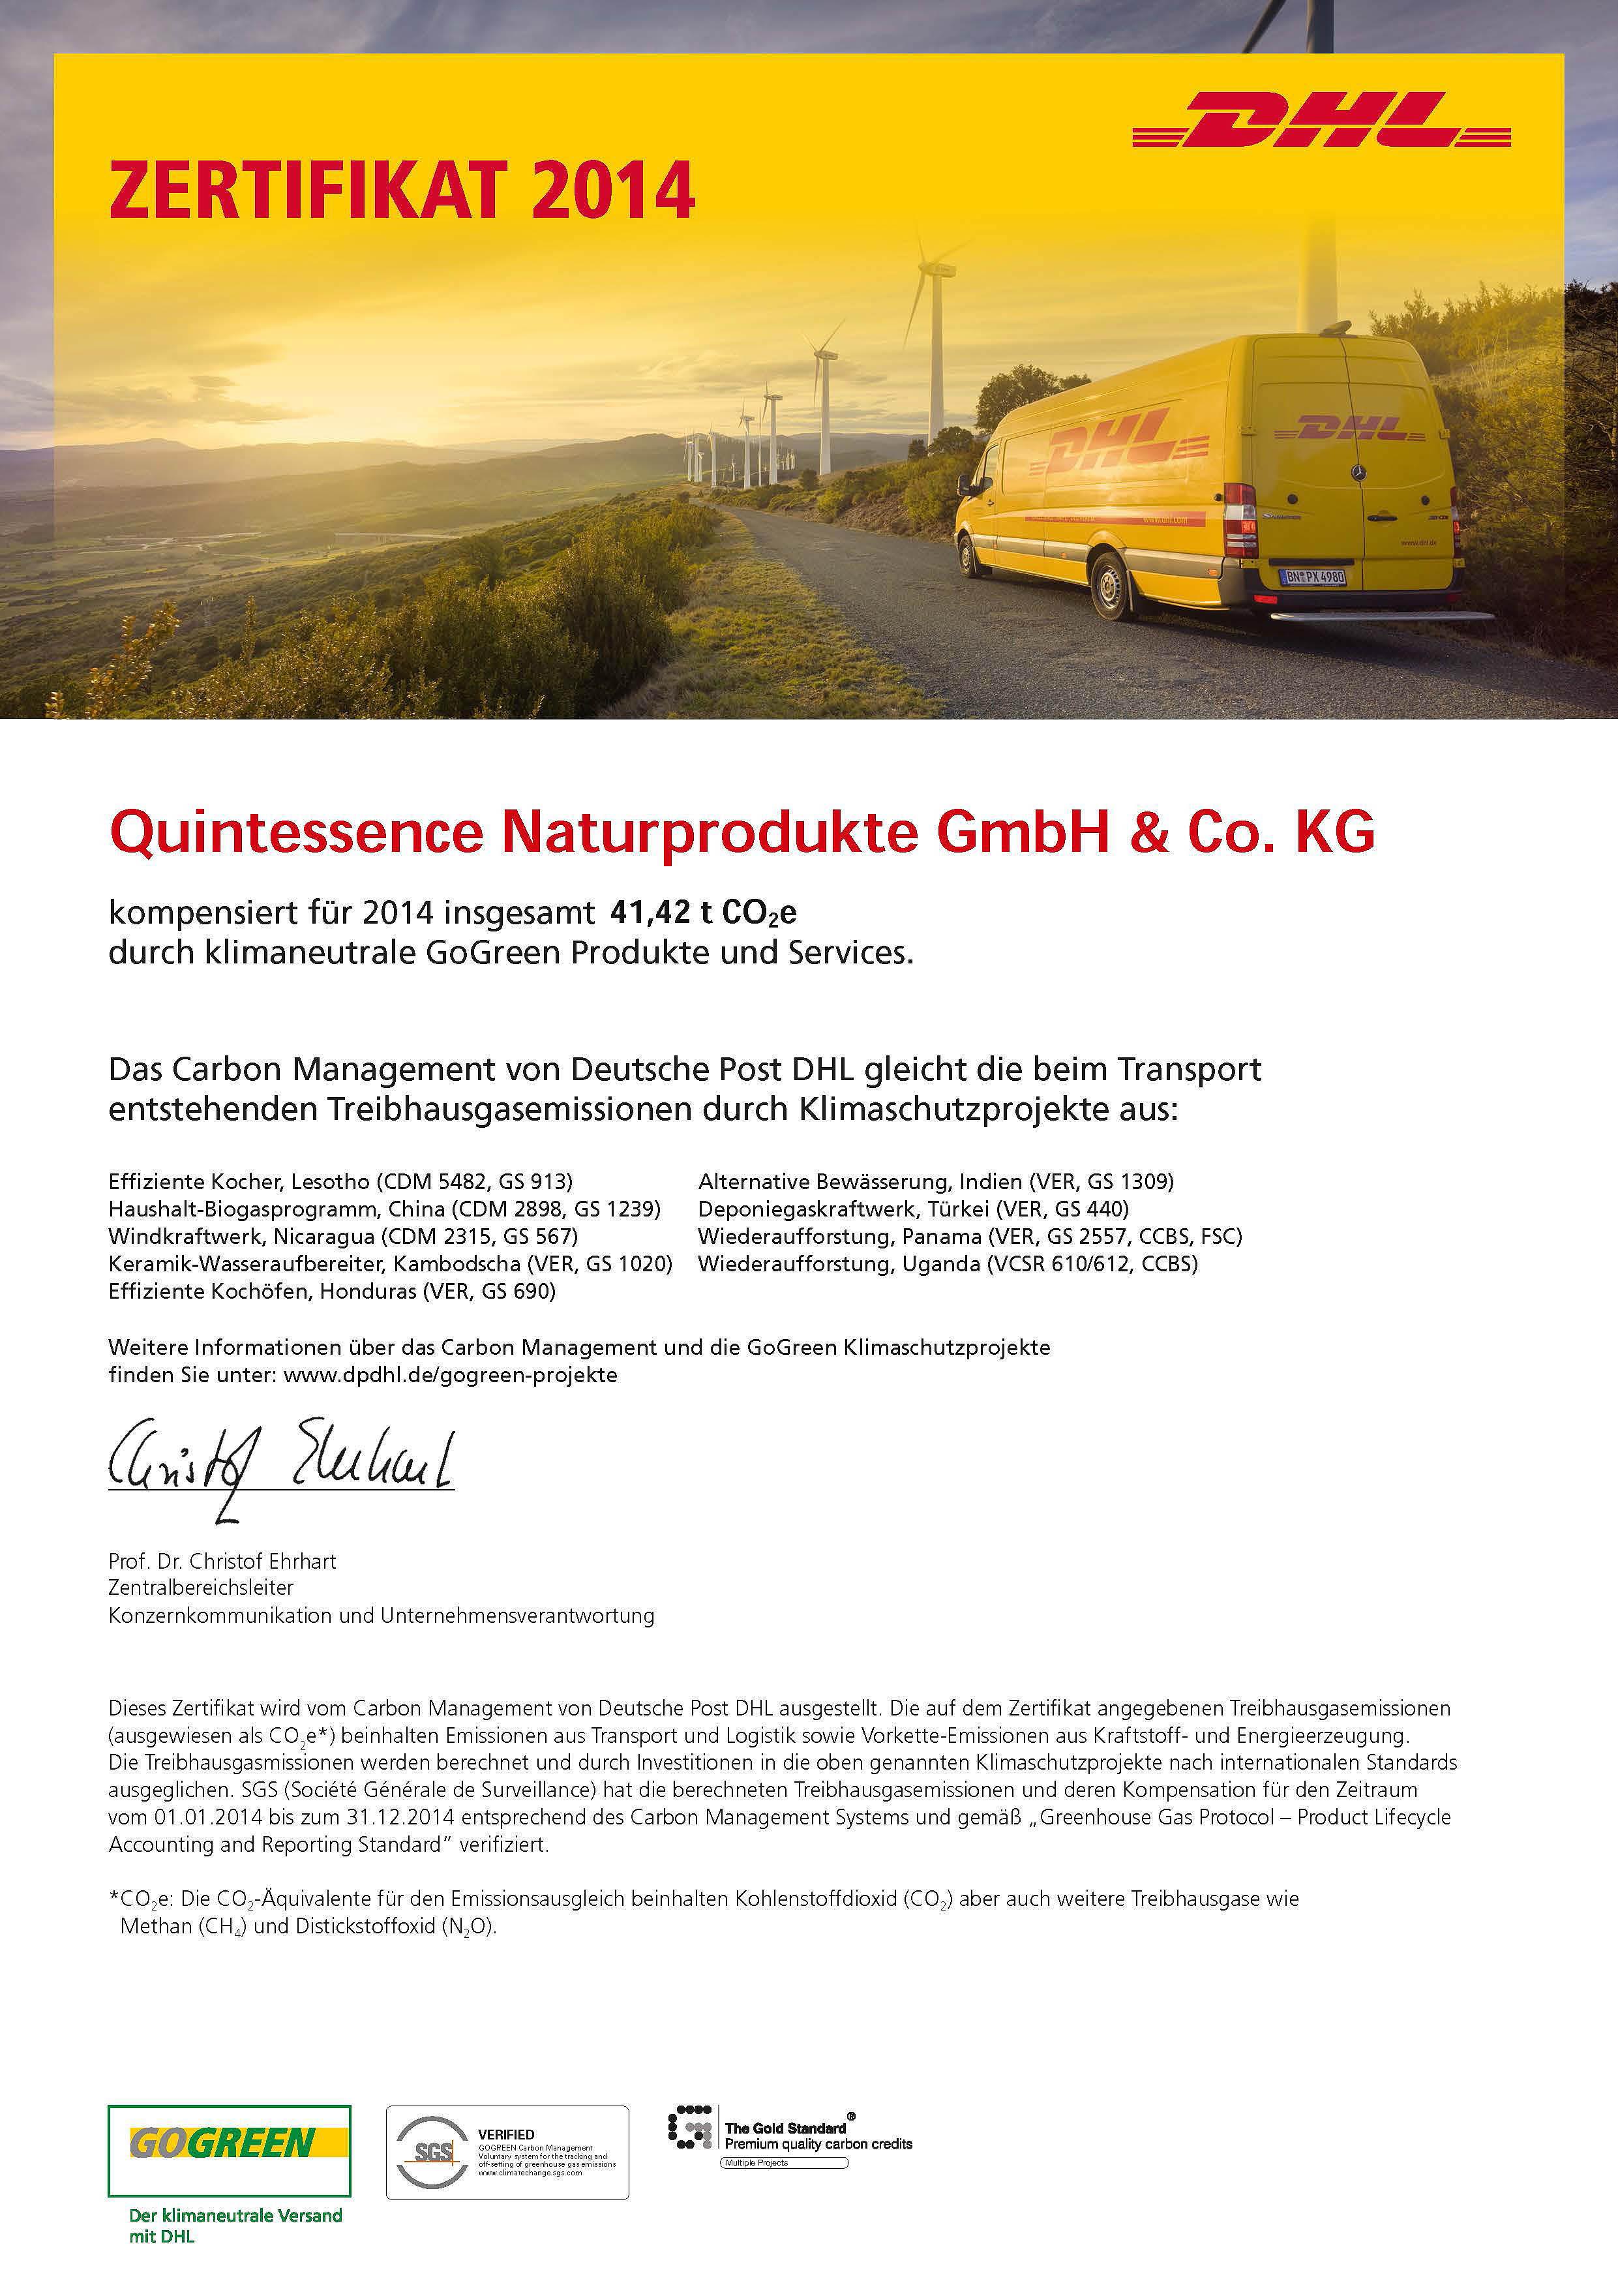 DHL-GoGreen-Zertifikat 2015